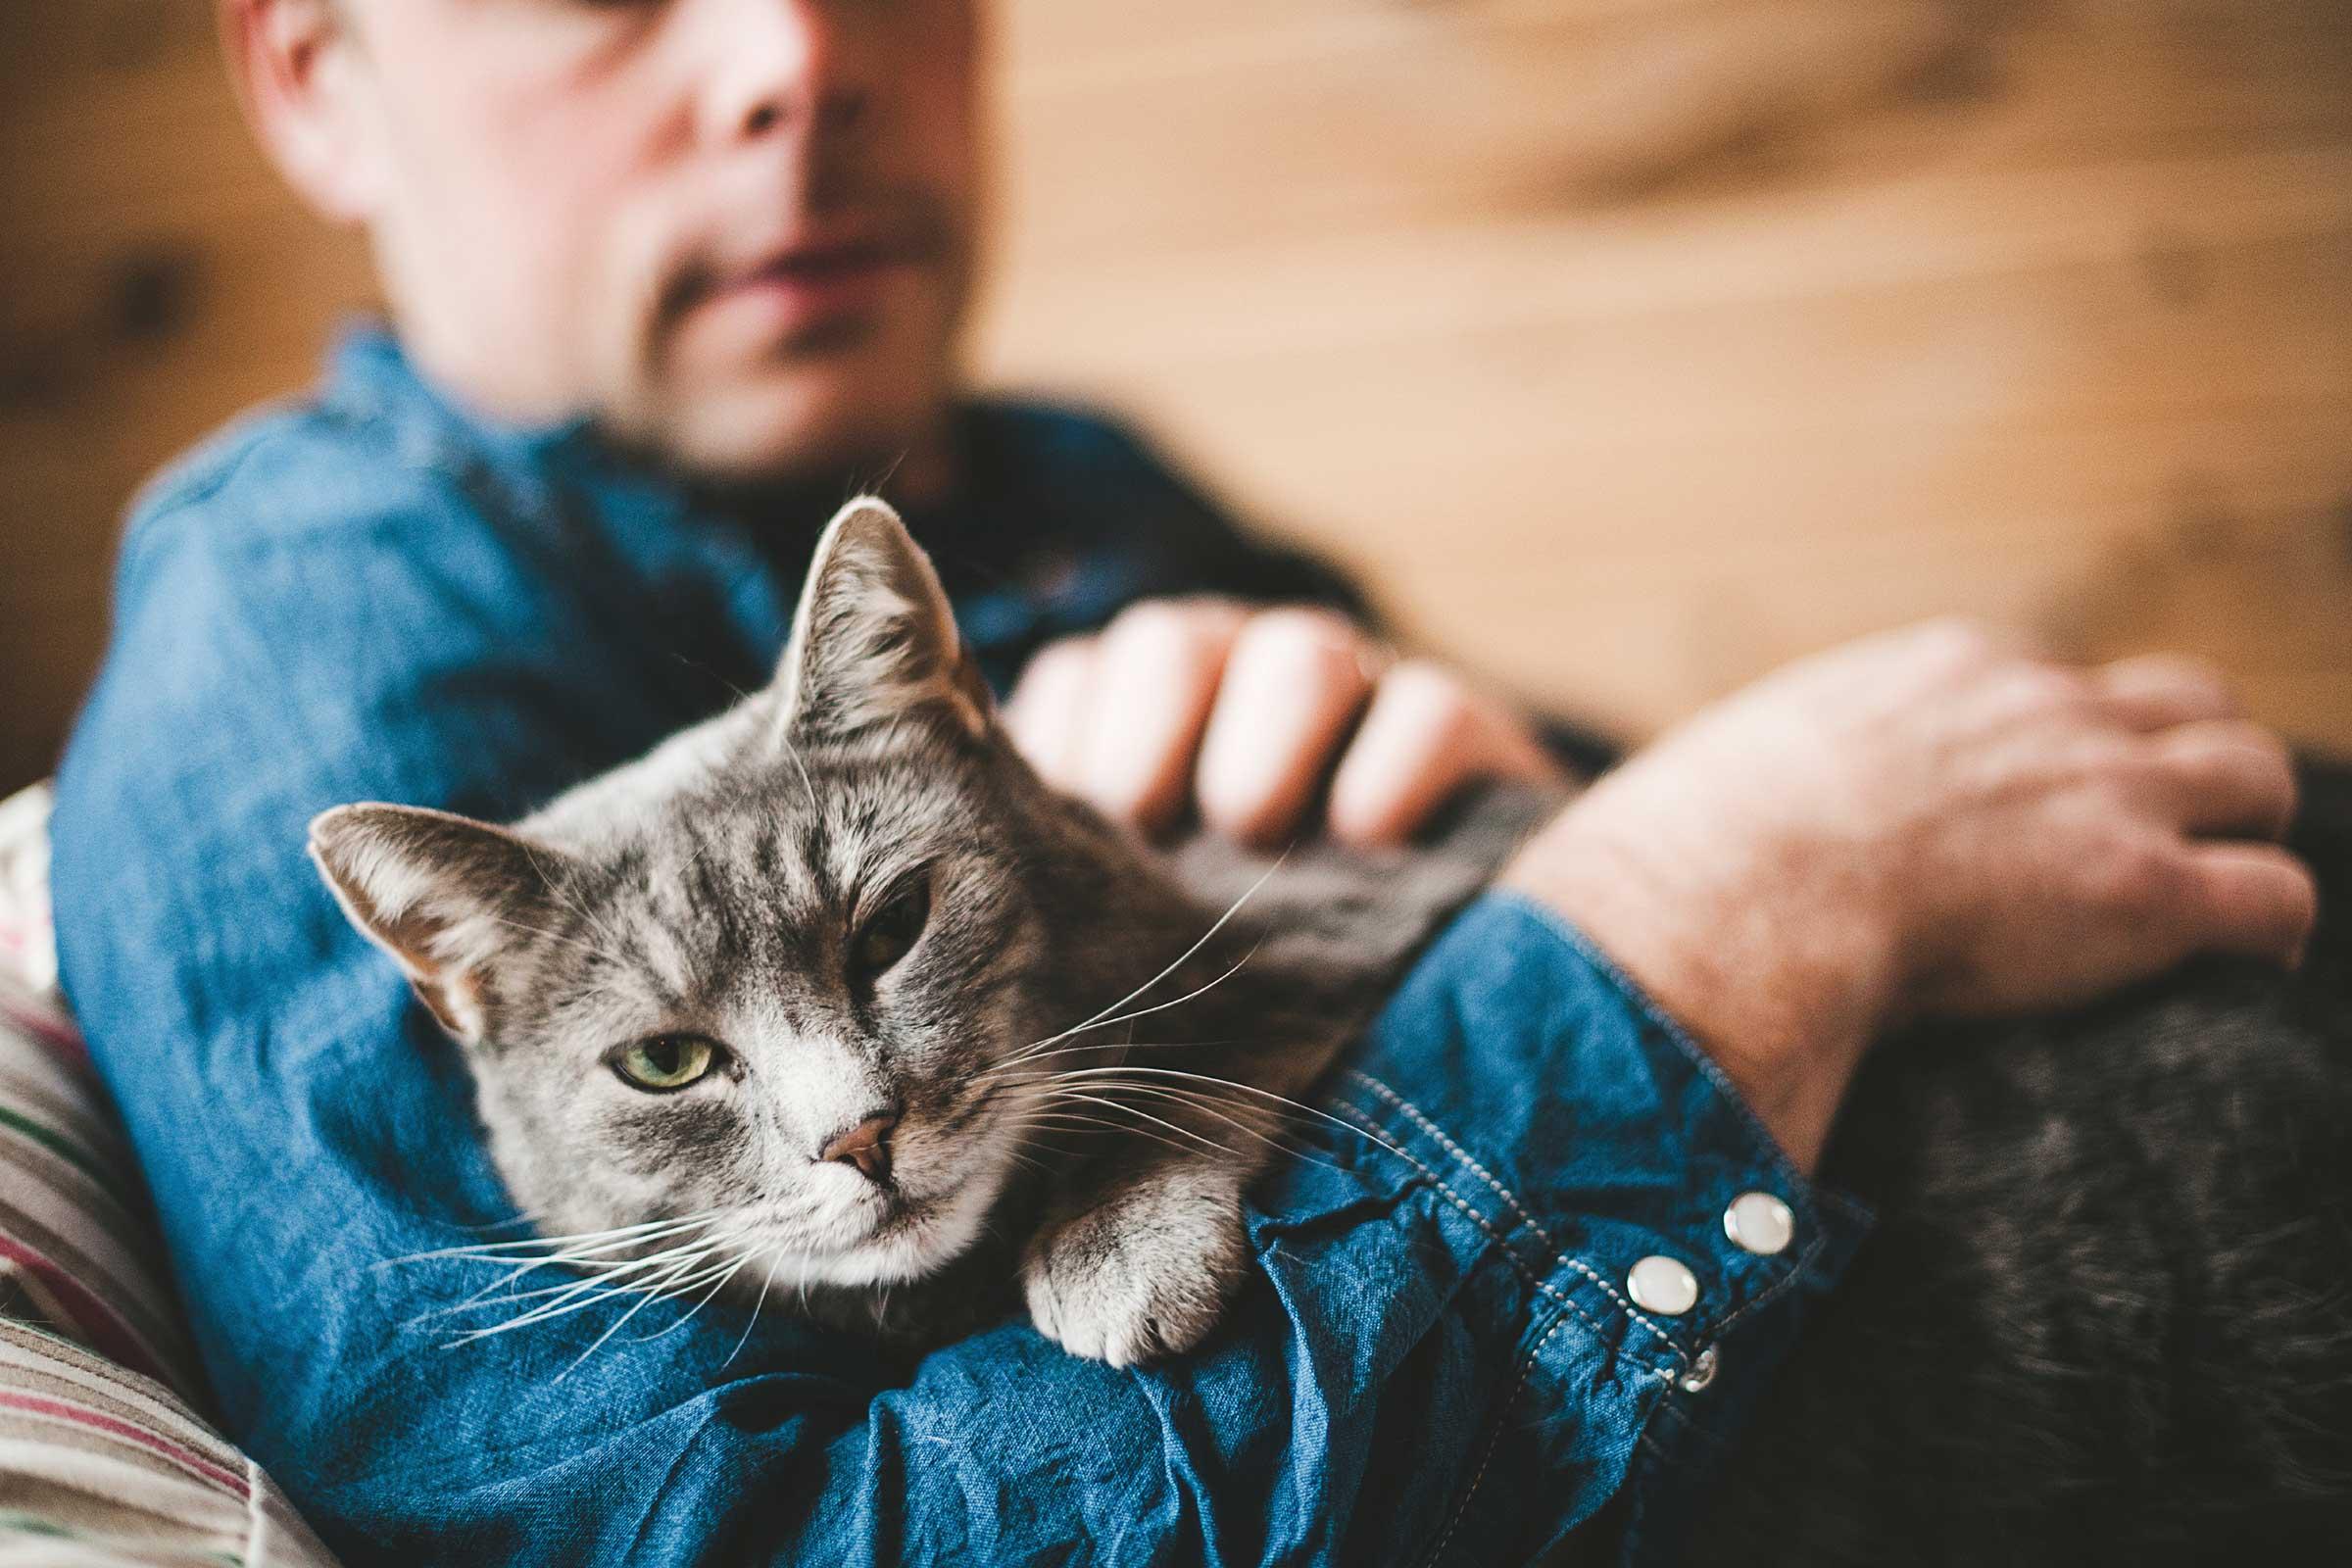 67b7a706b789 Η τροφή που πρέπει να χρησιμοποιείτε αν η γάτα σας έχει πεπτικές διαταραχές